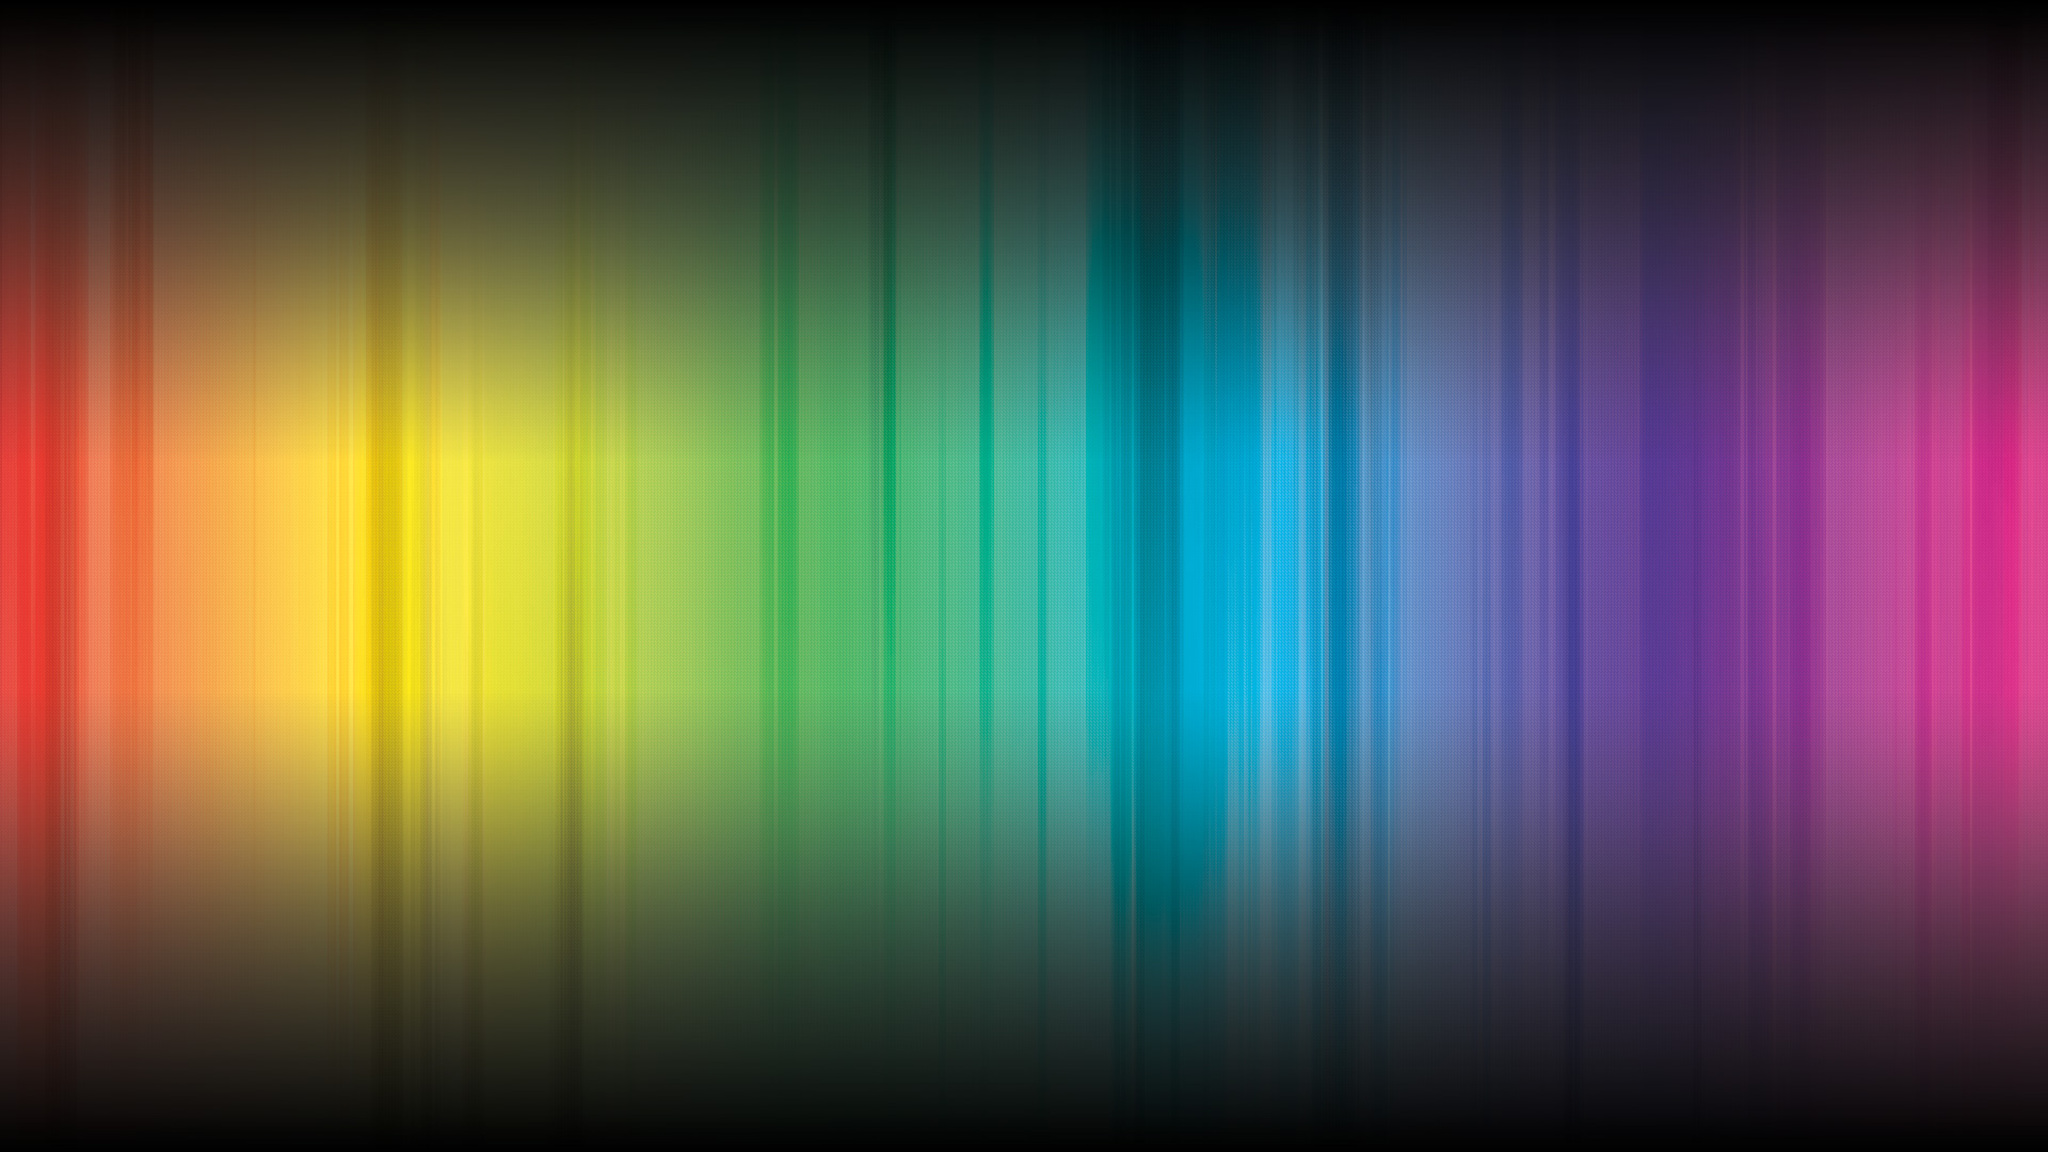 2048x1152 Rainbow Spectrum Hd 2048x1152 Resolution Hd 4k